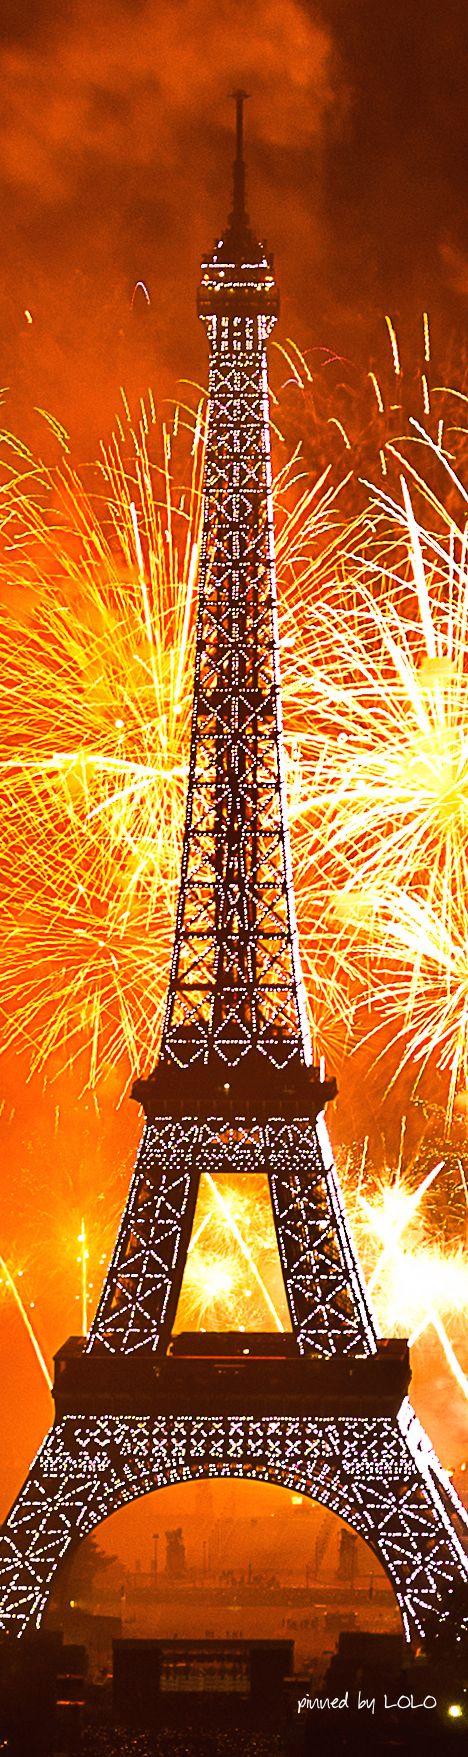 Eiffel Tower...Paris | LOLO (image by Yann Caradec via Flickr)